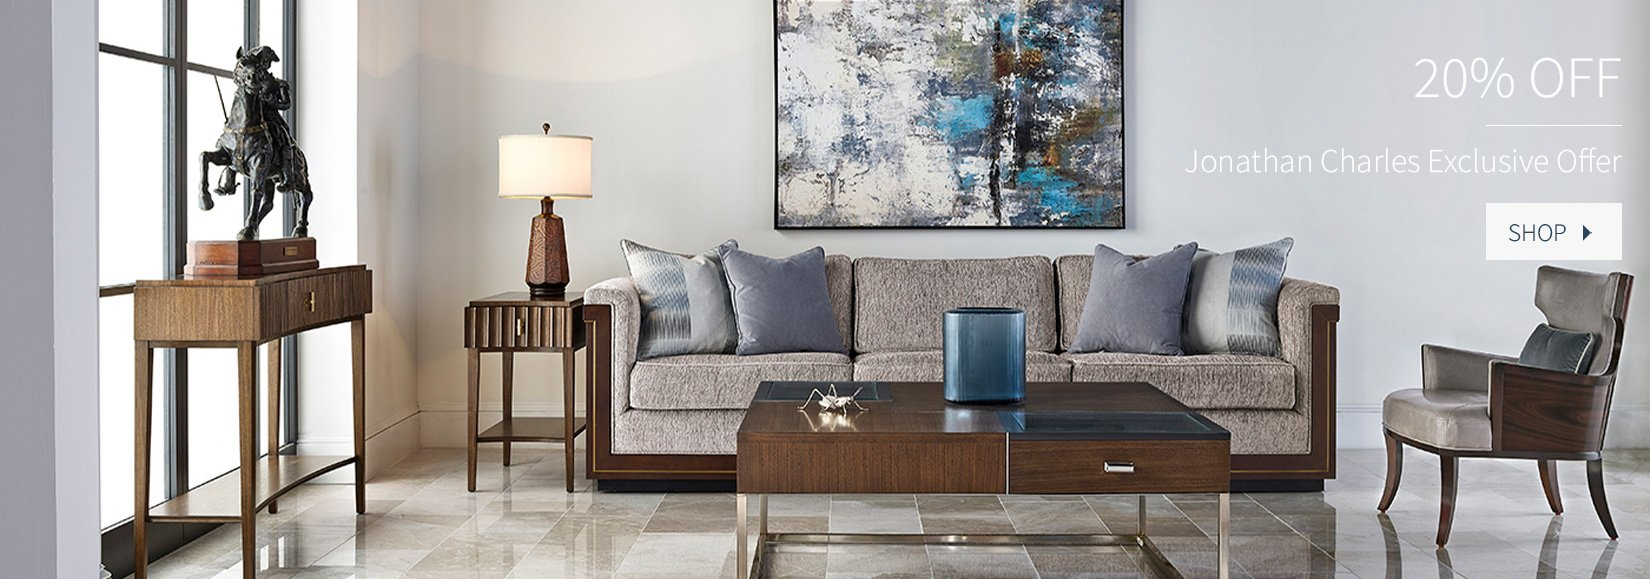 20% Off Jonathan Charles Fine Furniture